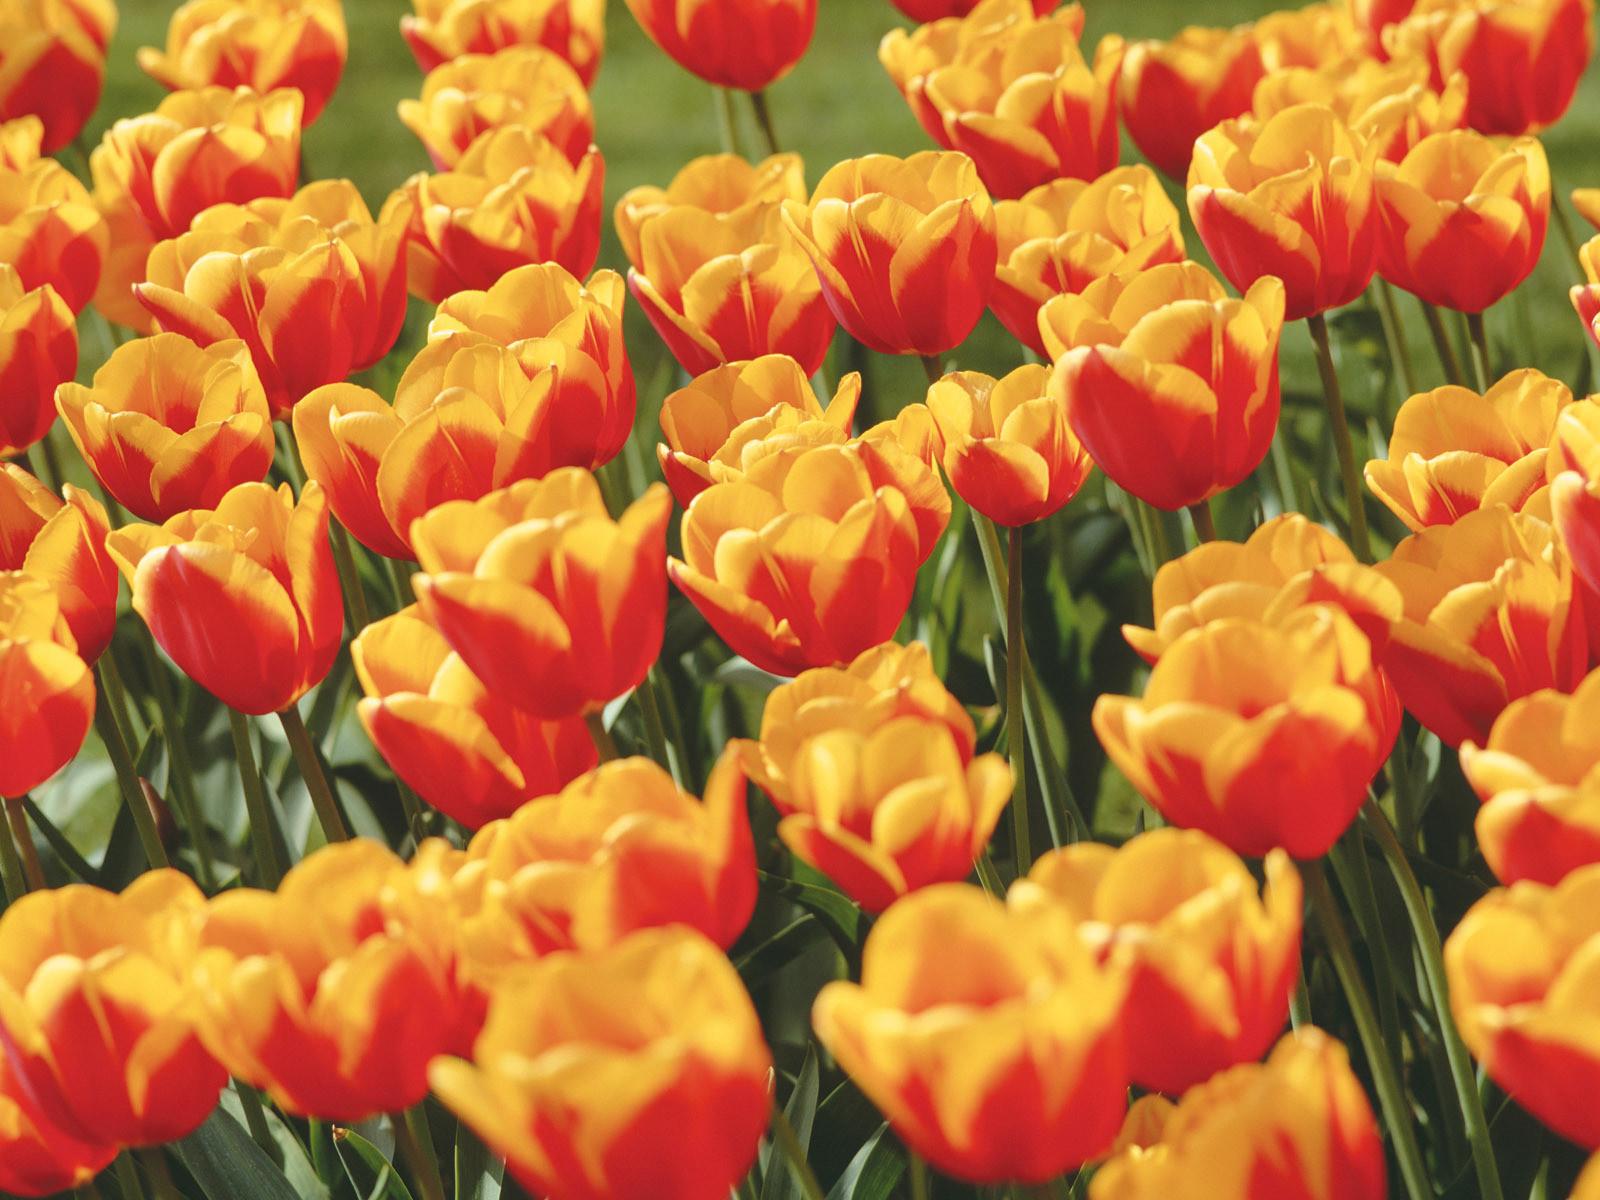 красно желтые тюльпаны фото